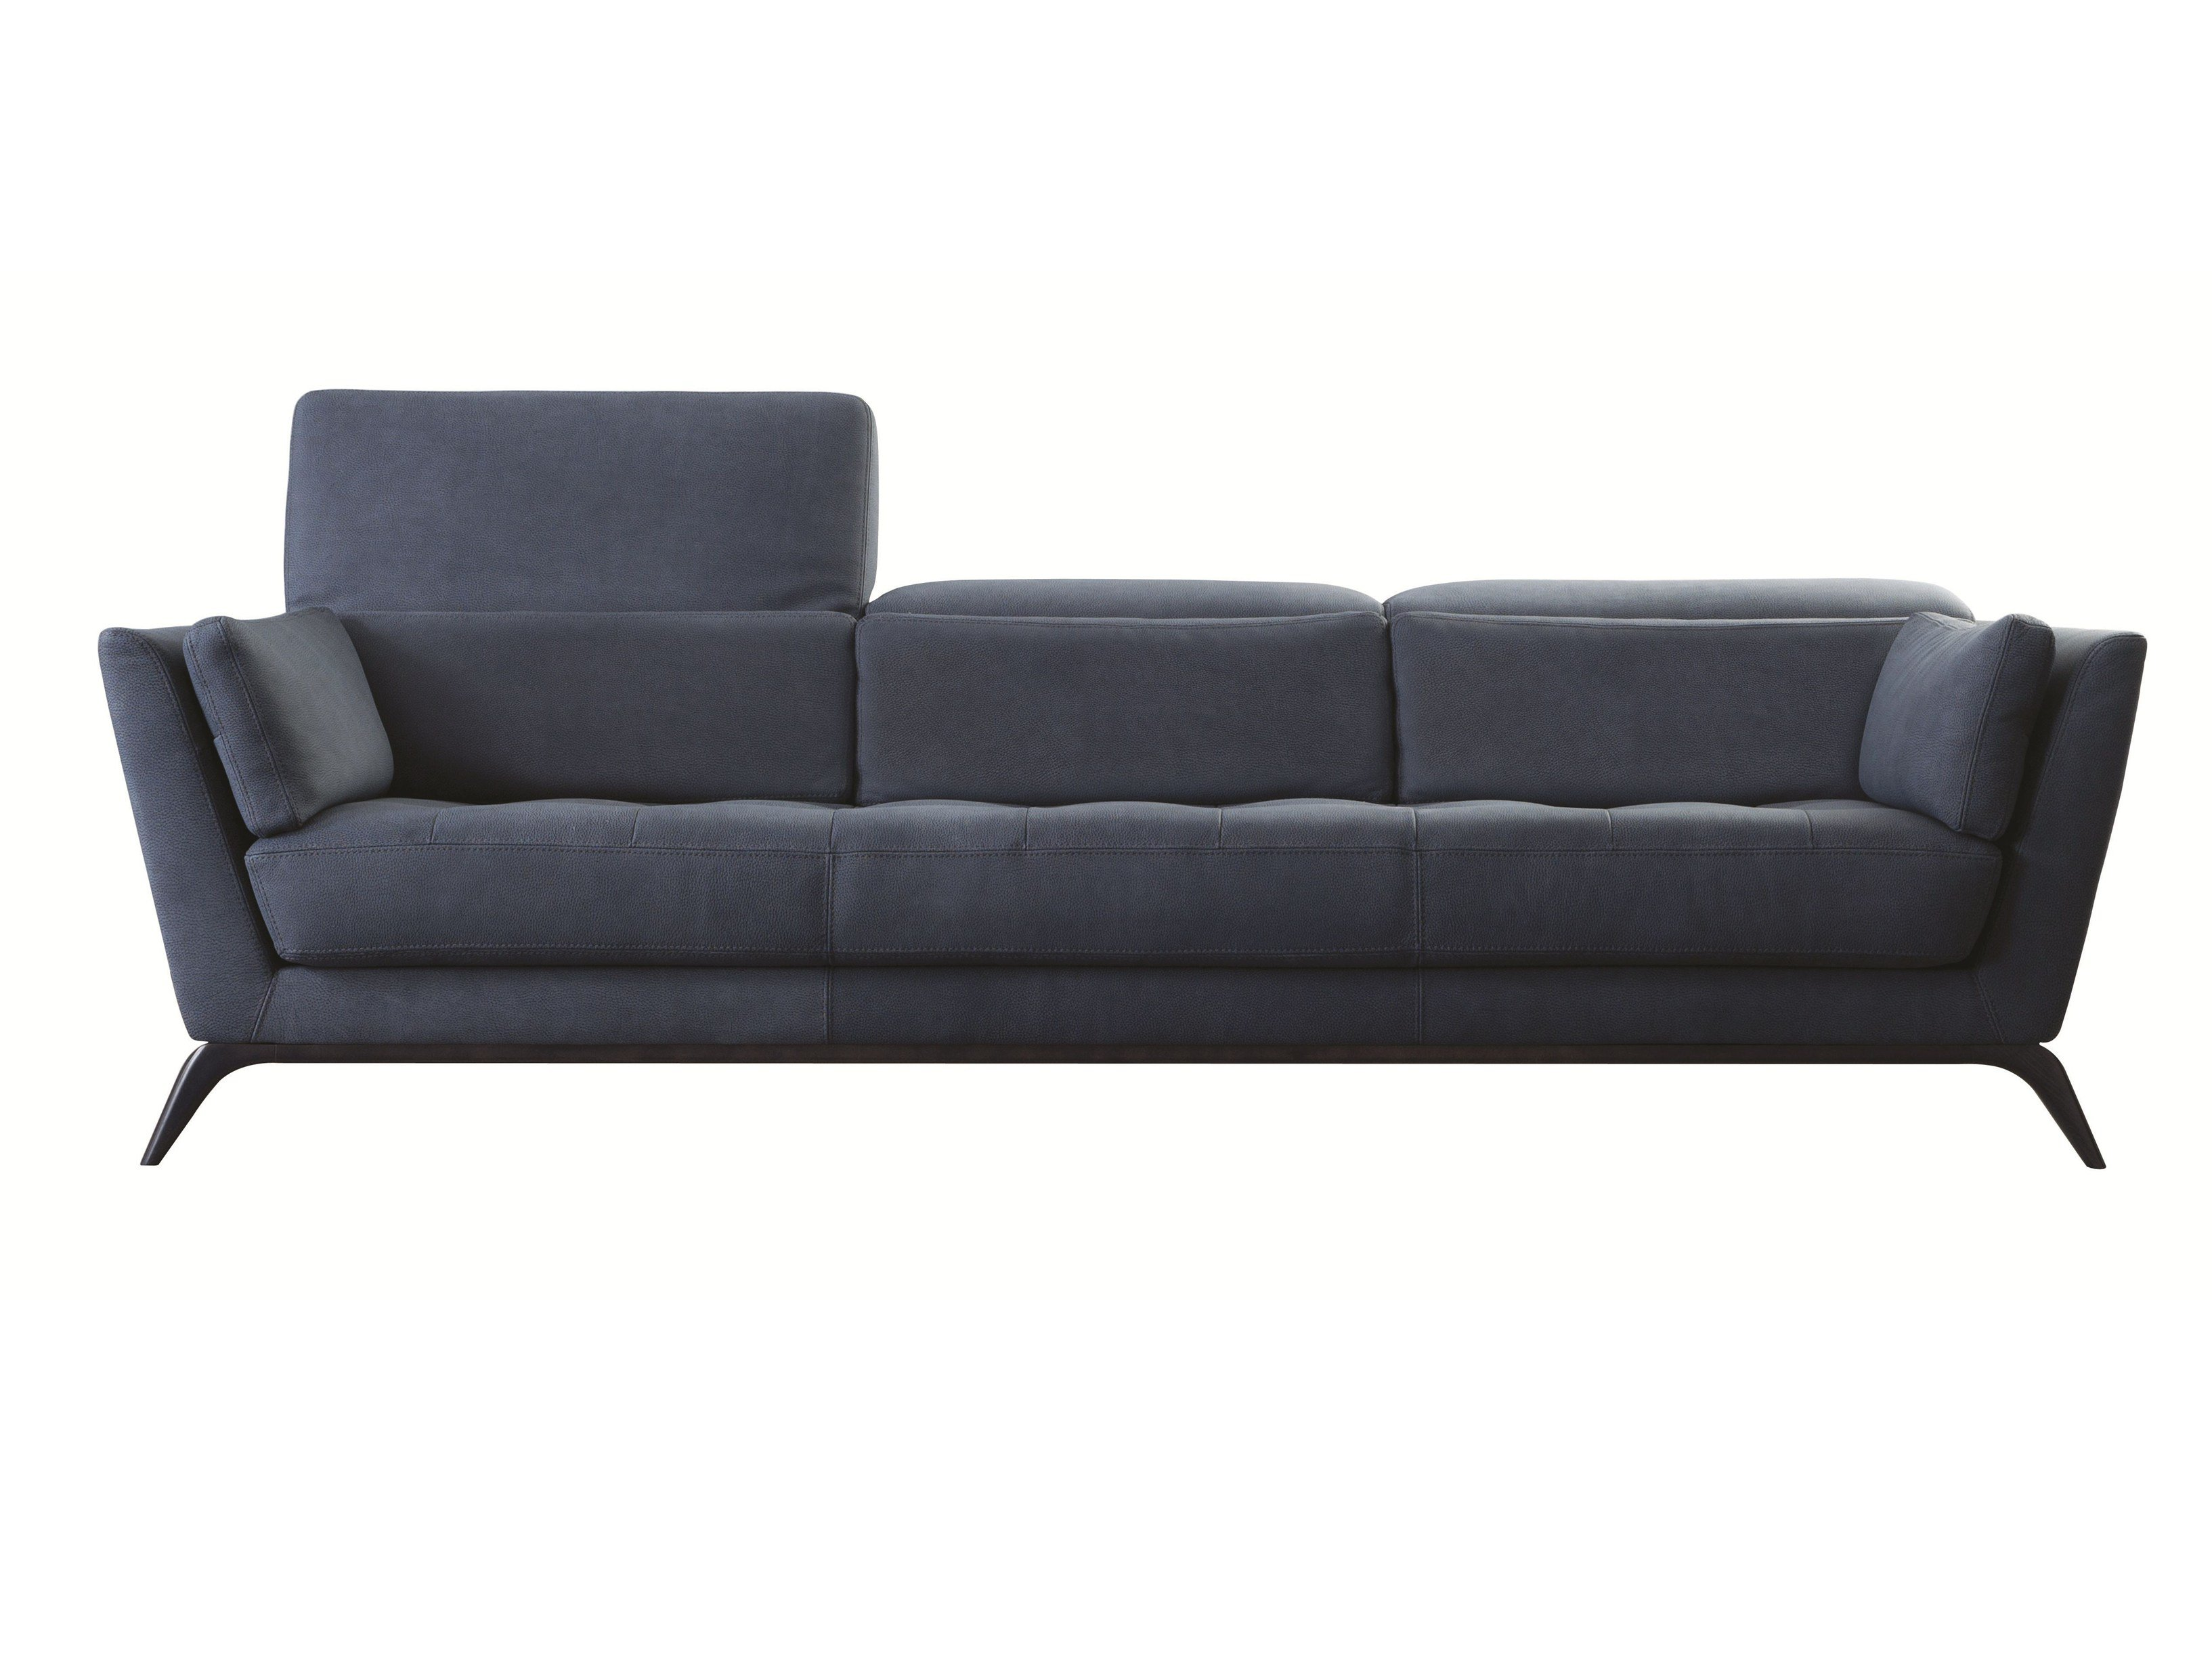 roche et bobois soldes free canap bleu roche bobois with. Black Bedroom Furniture Sets. Home Design Ideas